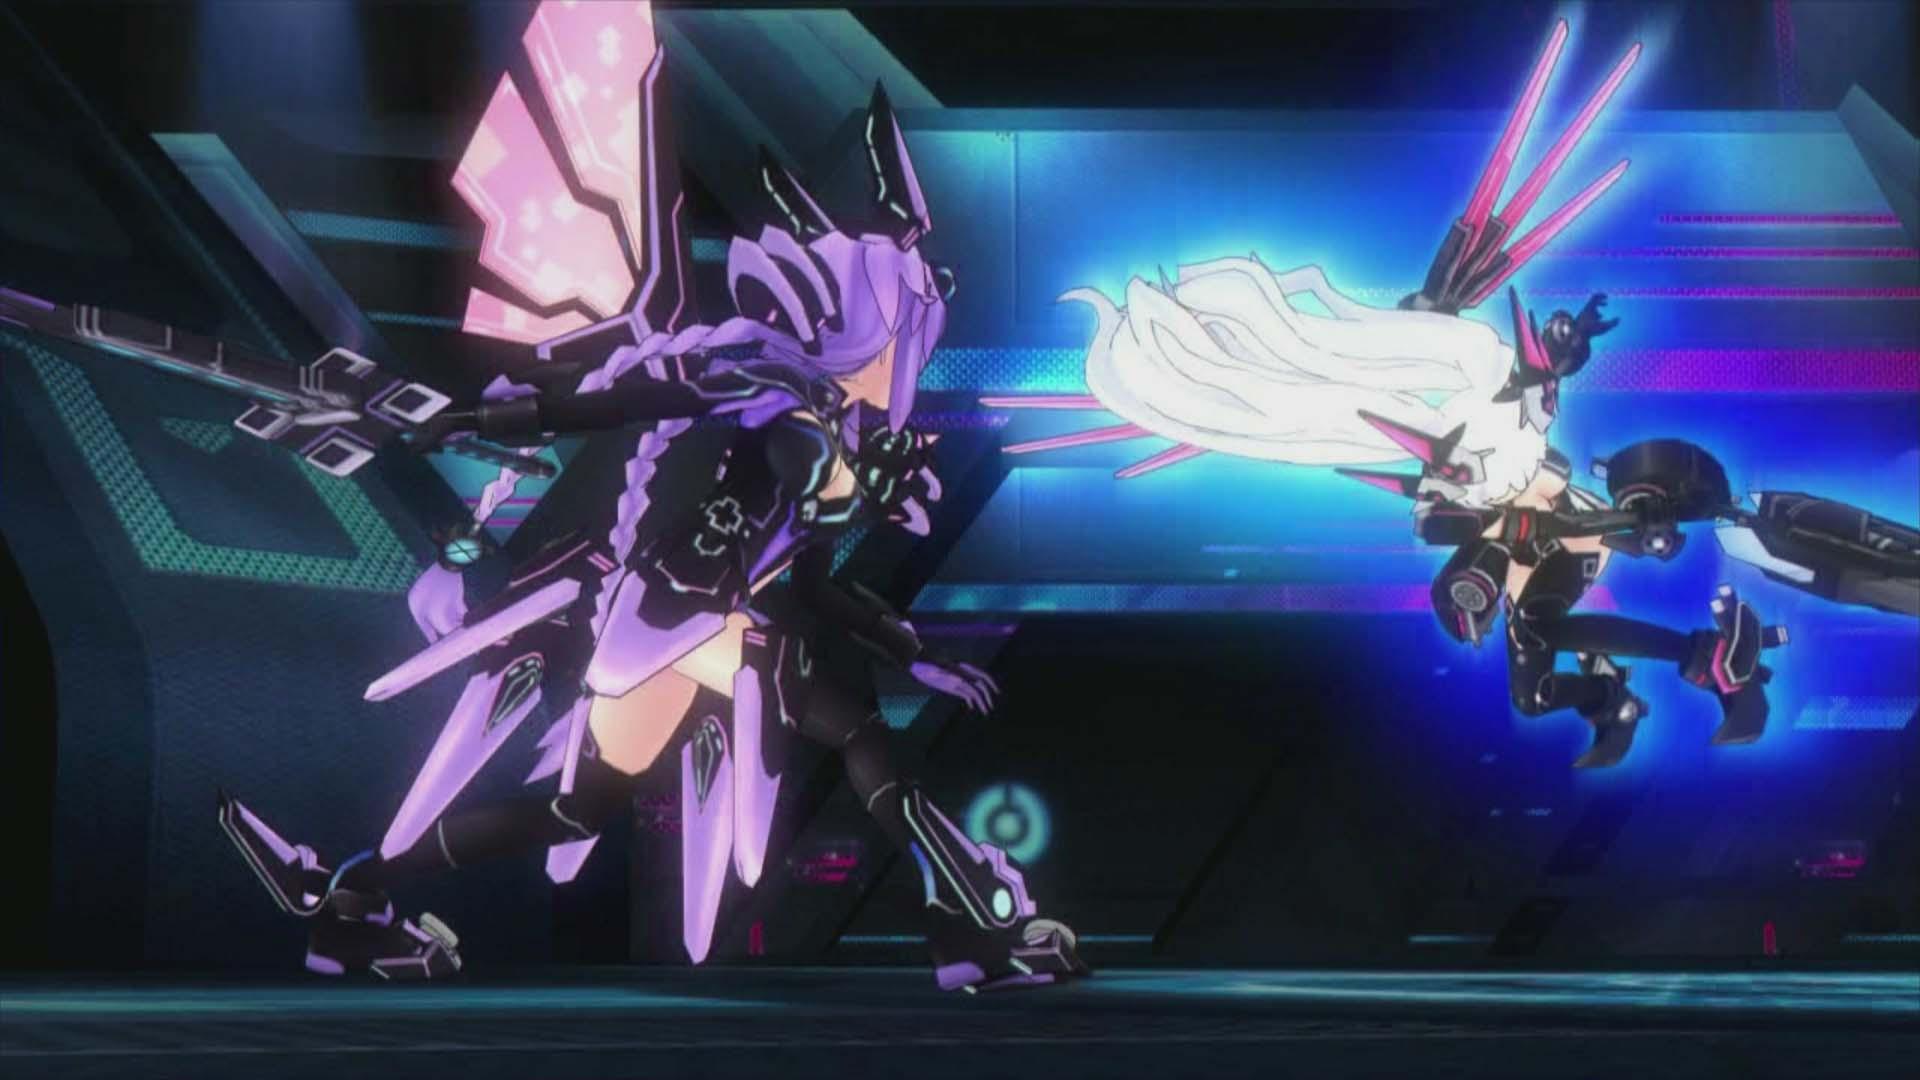 Wallpaper Girl Sggaminginfo 187 Hyperdimension Neptunia Victory Review